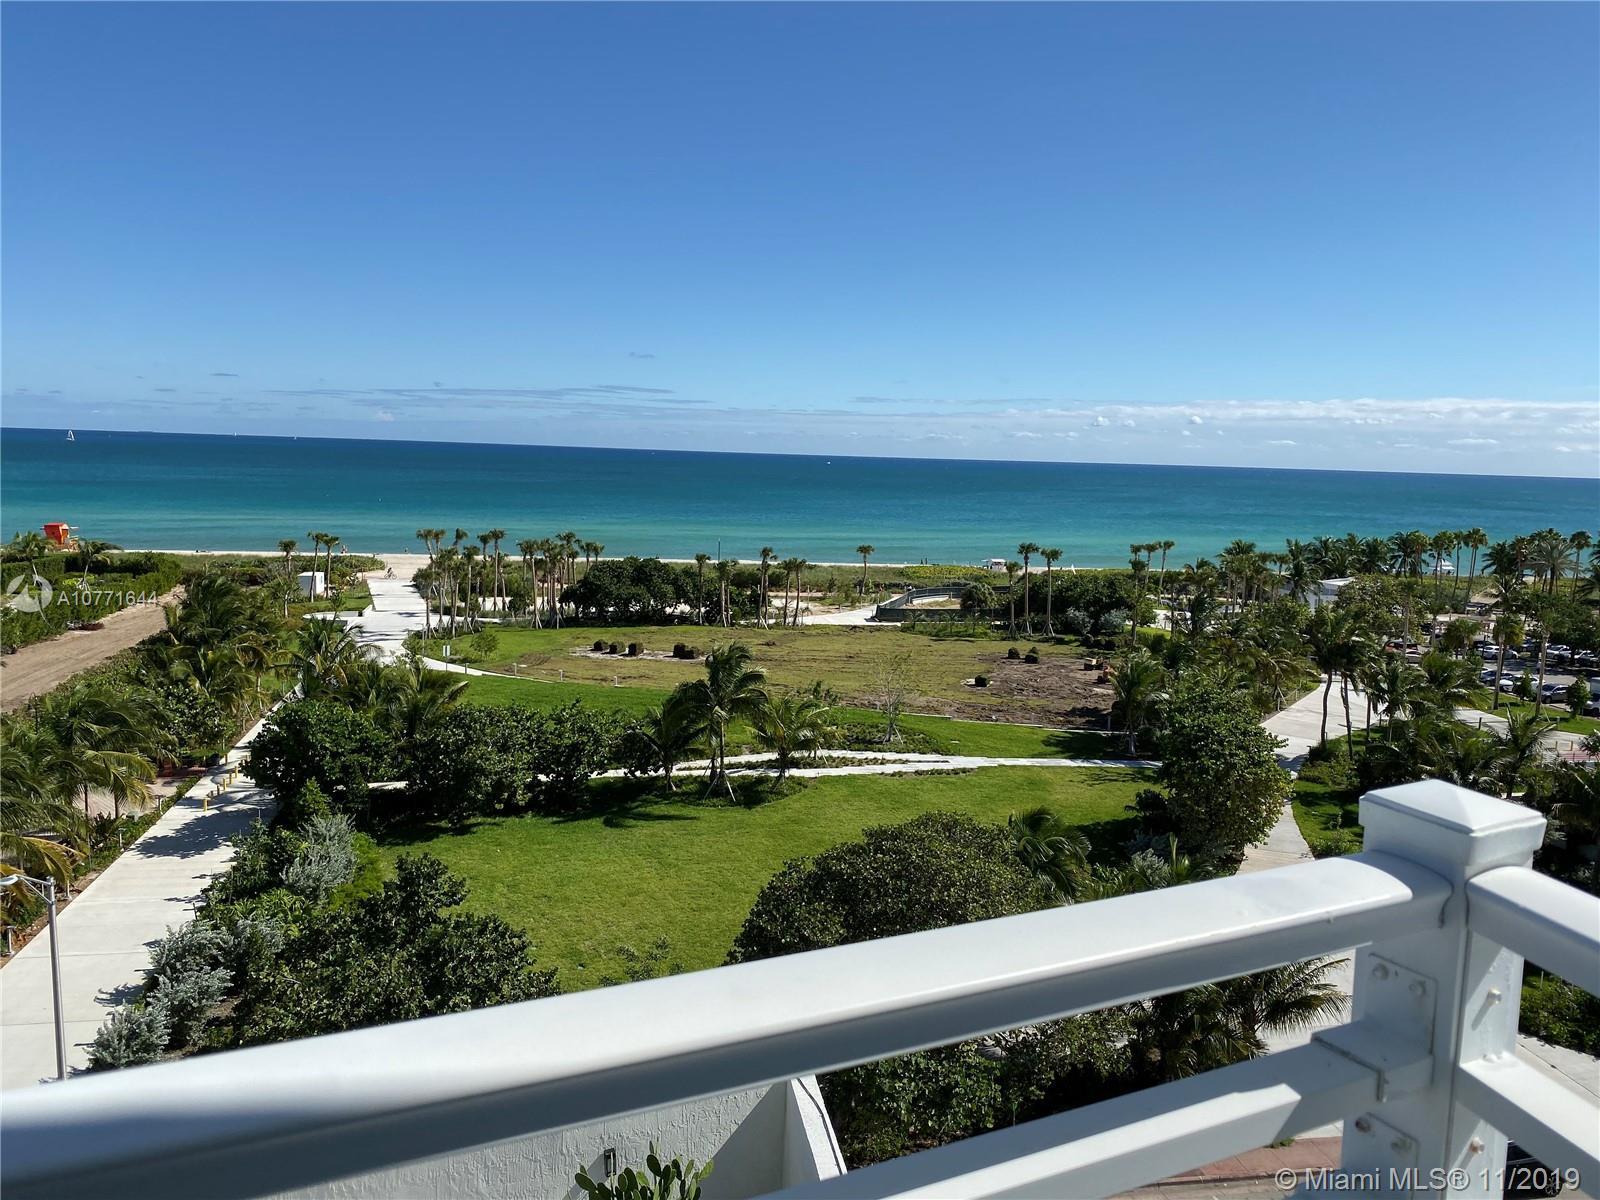 7600 Collins Ave, 916 - Miami Beach, Florida